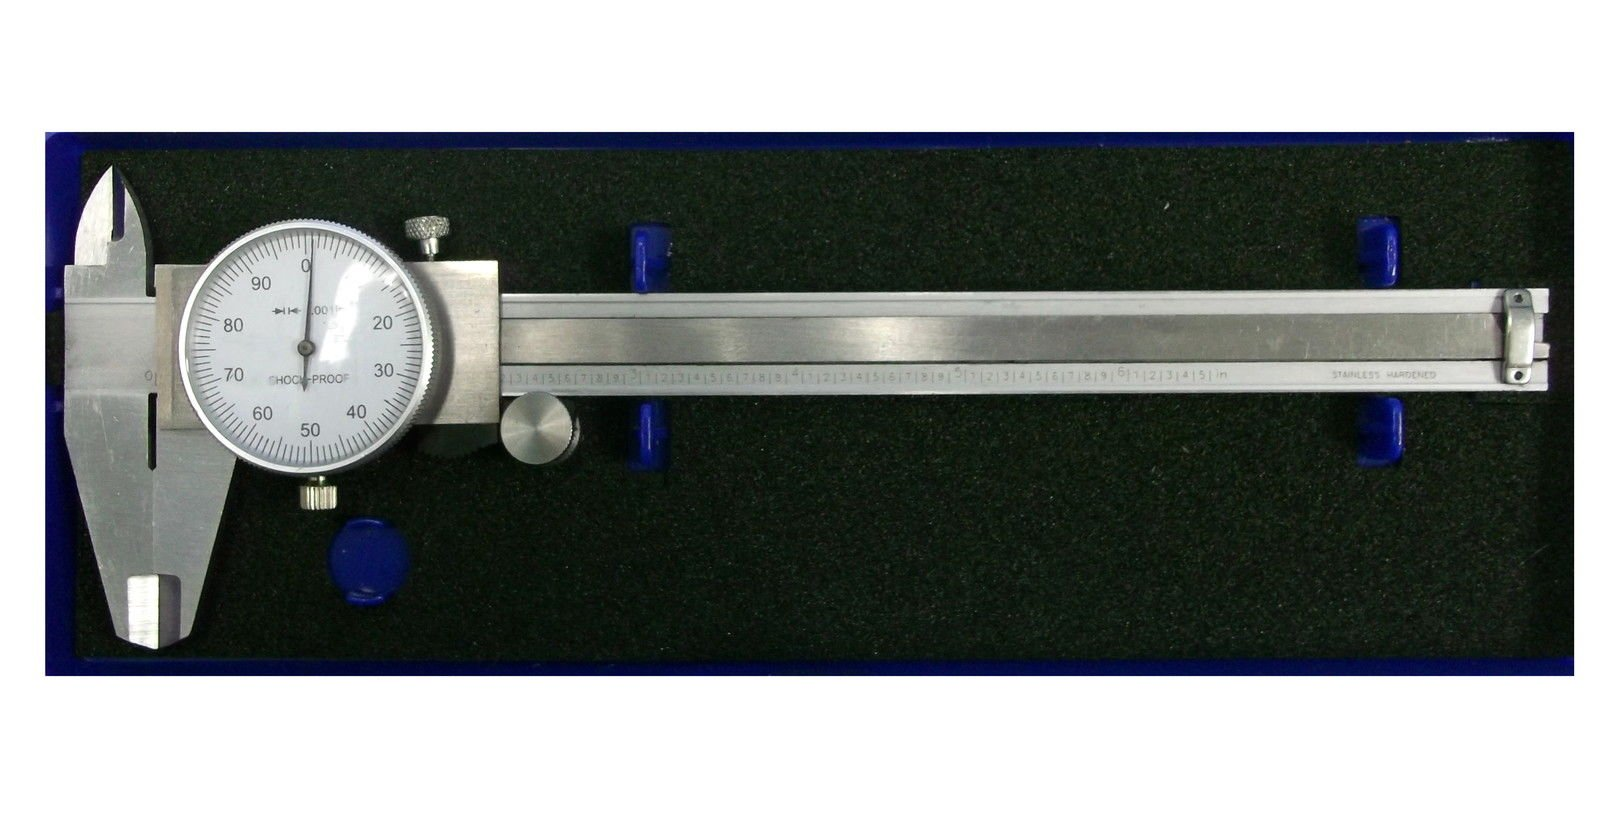 Enkay 806 - 6'' Steel Adjustable Dial Caliper With Plastic Storage Case